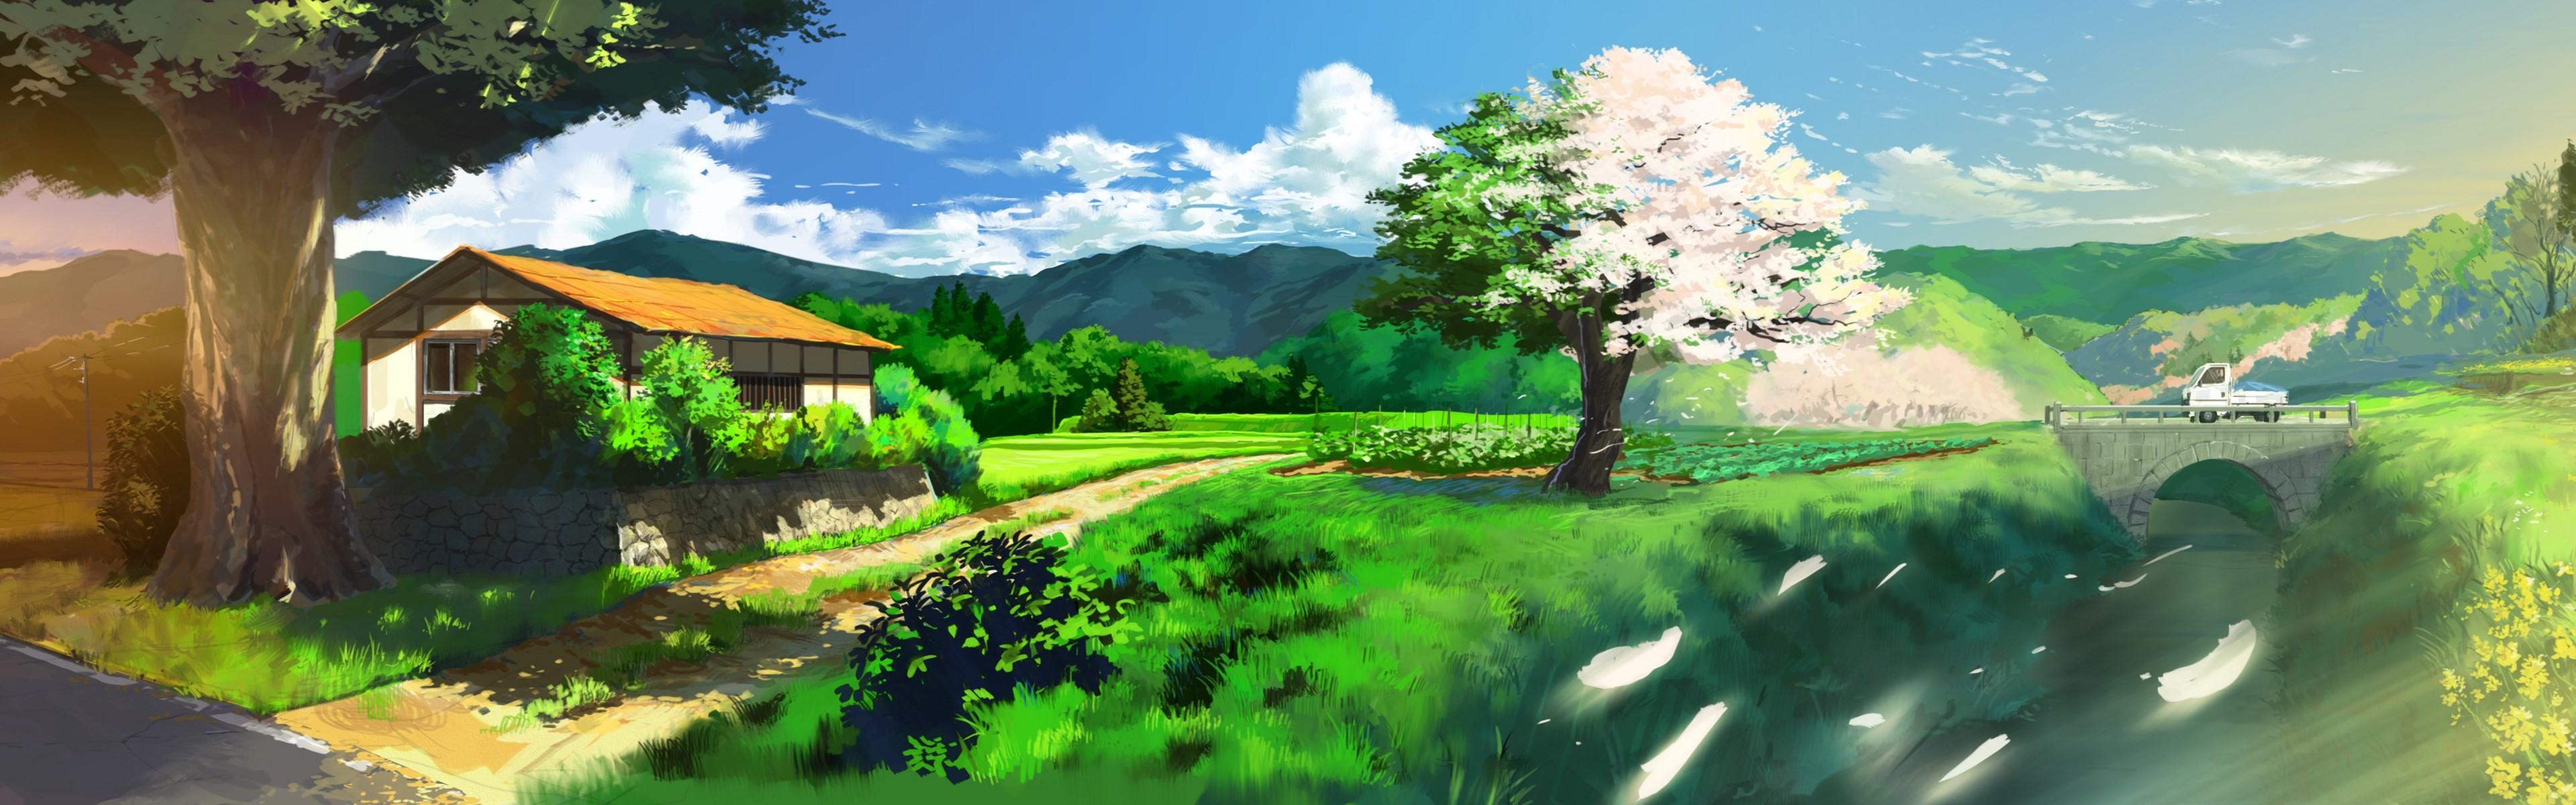 Anime dual monitor wallpaper 46 images - 2 screen wallpaper nature ...